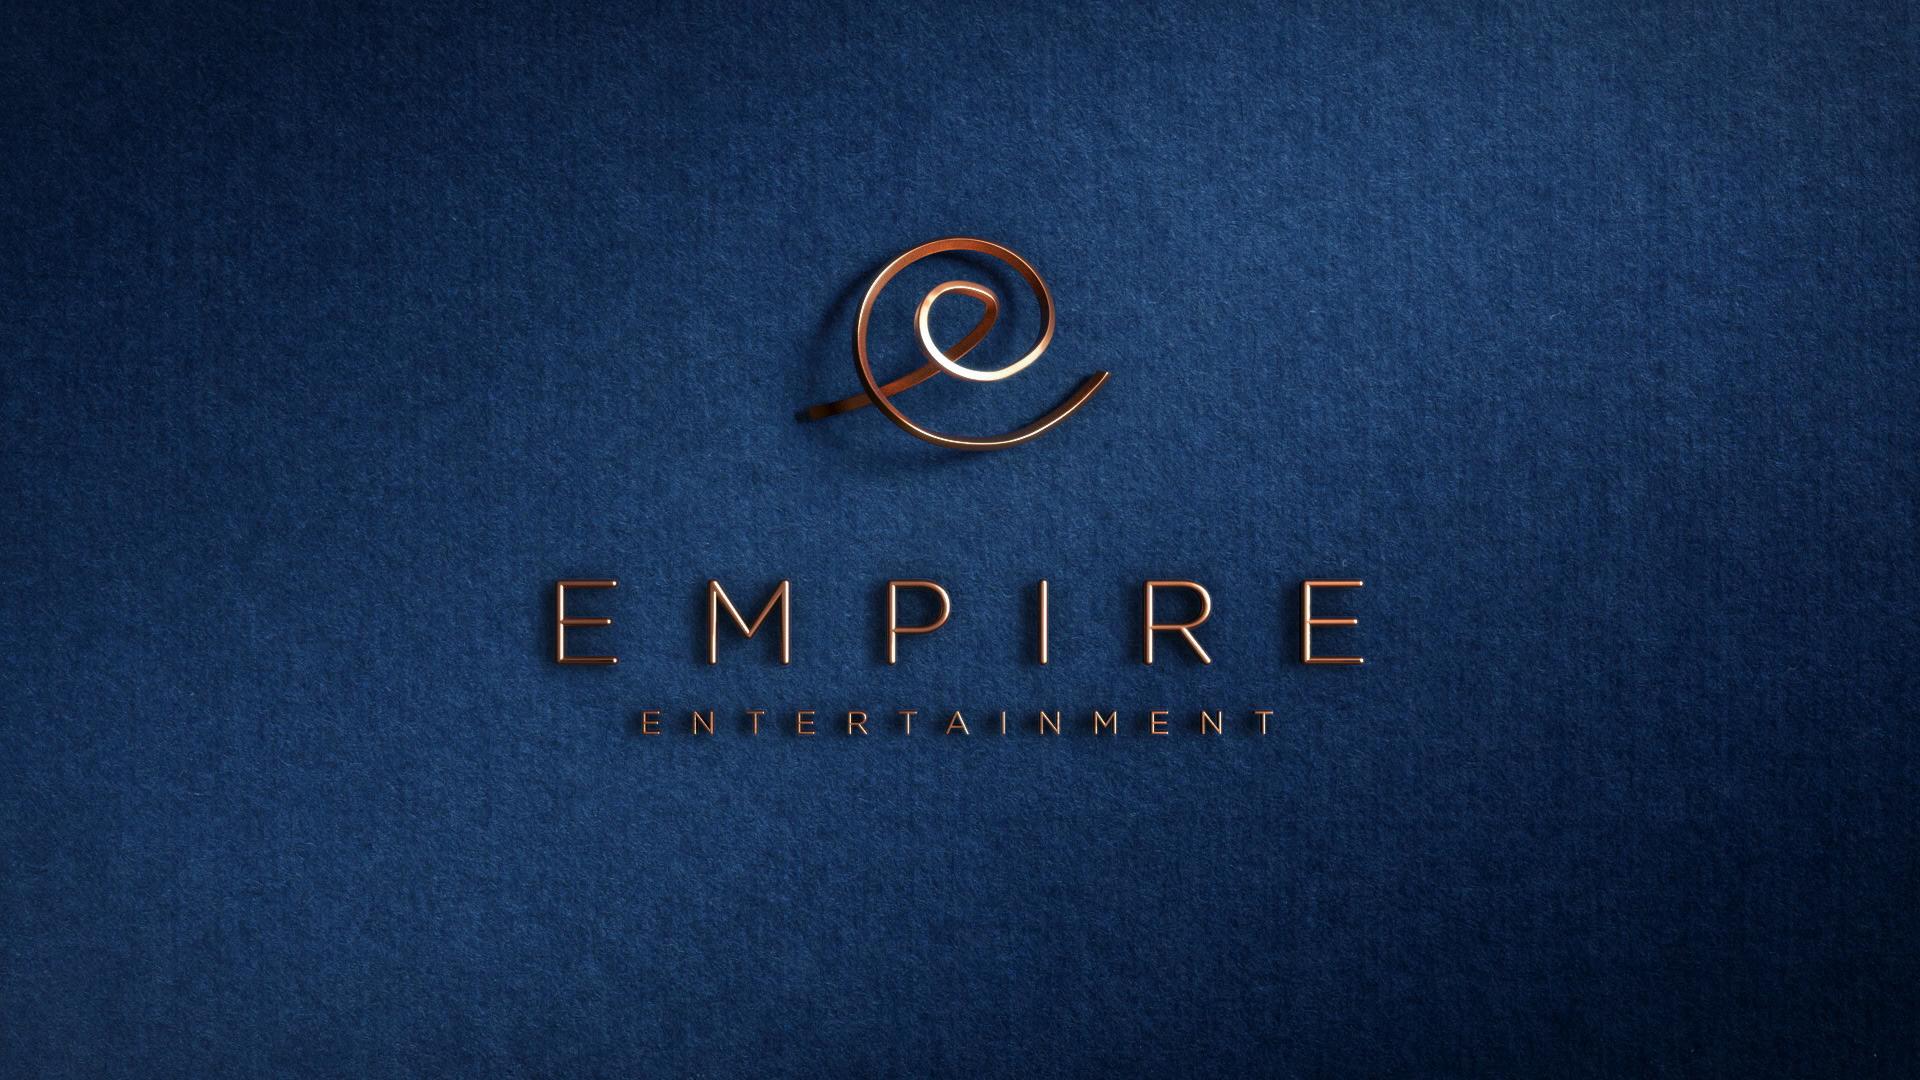 Empire Entertainment